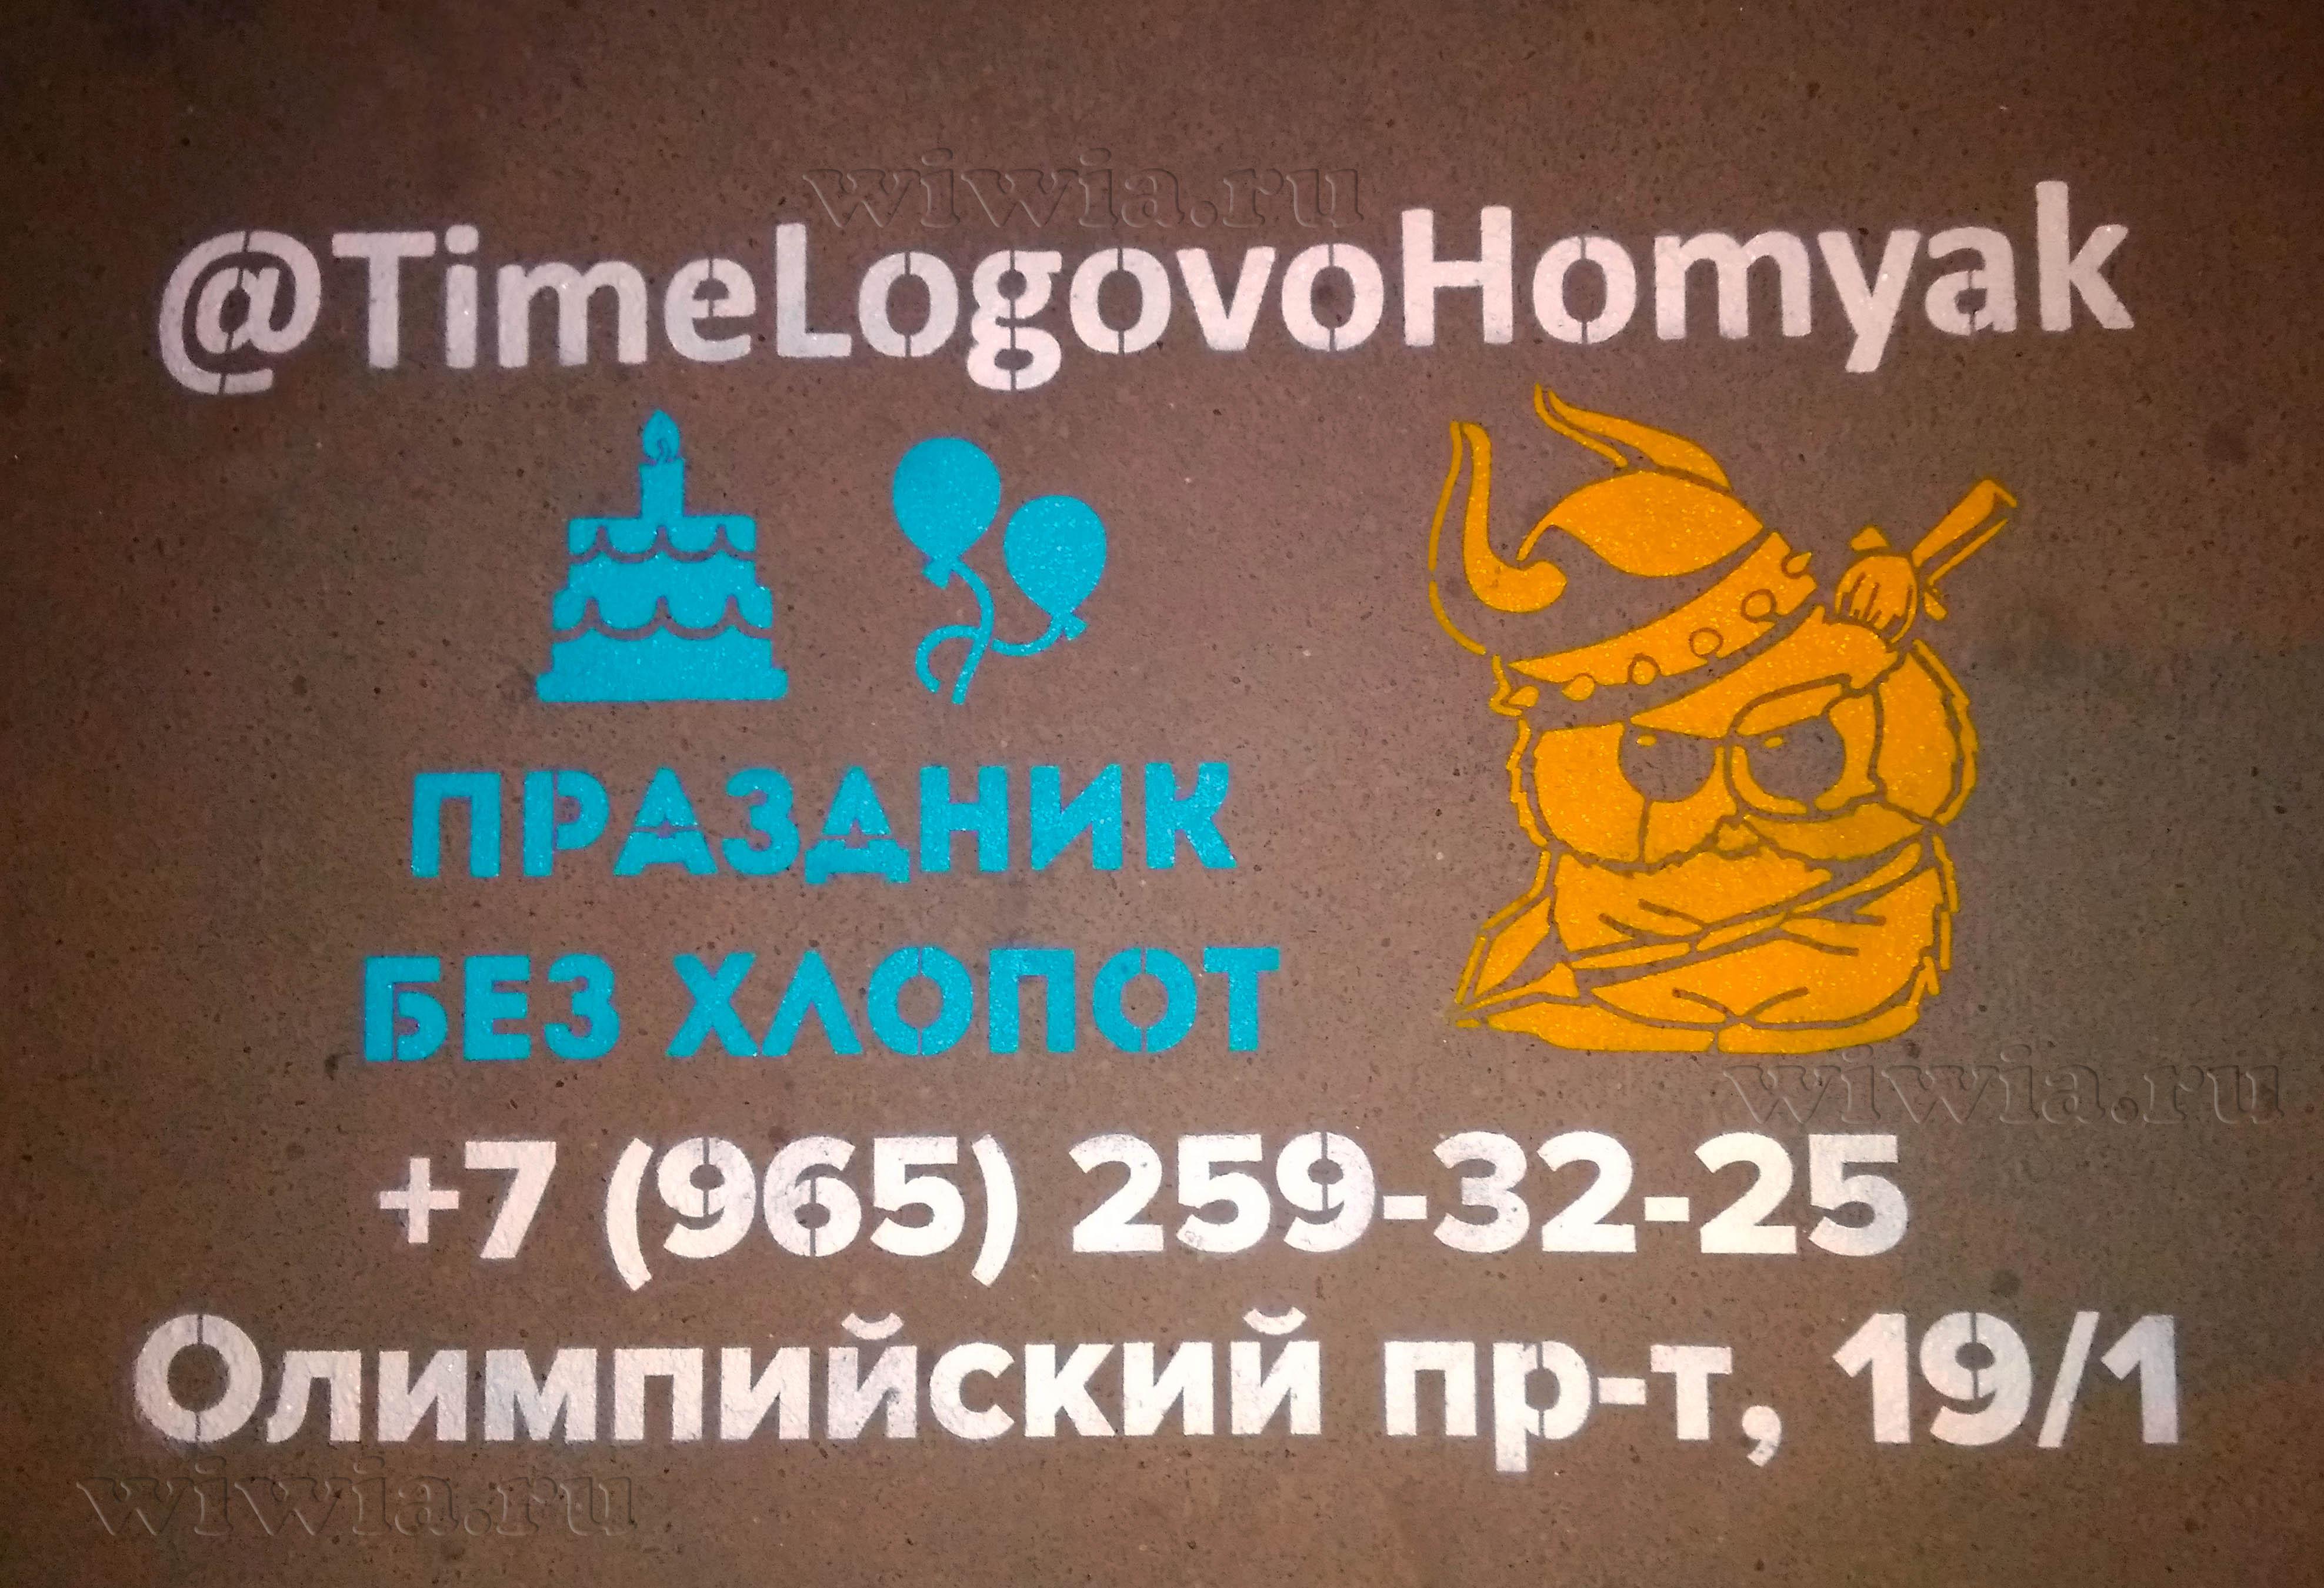 Реклама на асфальте для антикафе Хомяк